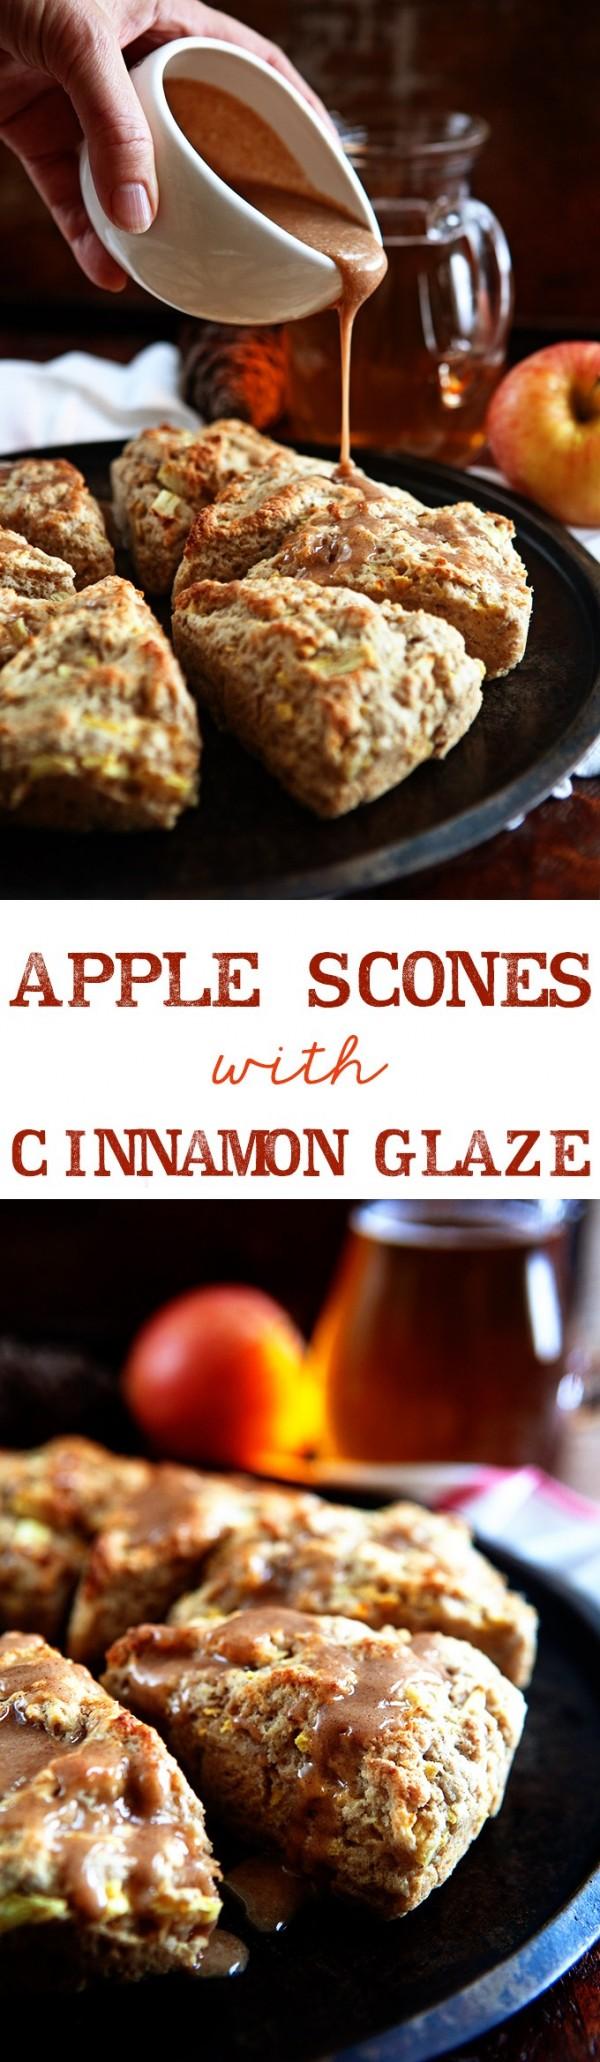 Get the recipe Apple Scones with Cinnamon Glaze @recipes_to_go